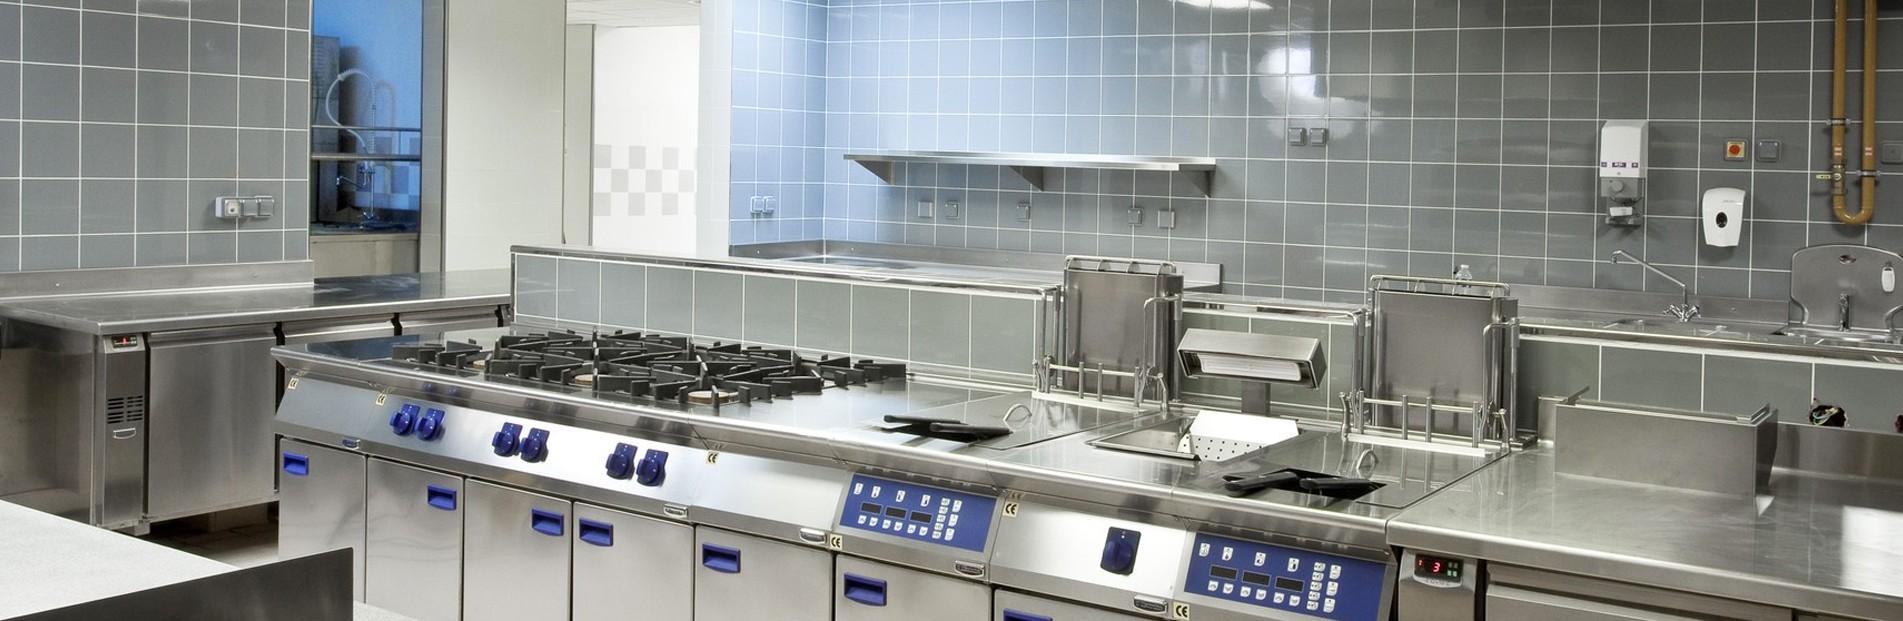 Mat riel cuisine professionnel inox promatokaz for Materiel cuisine inox